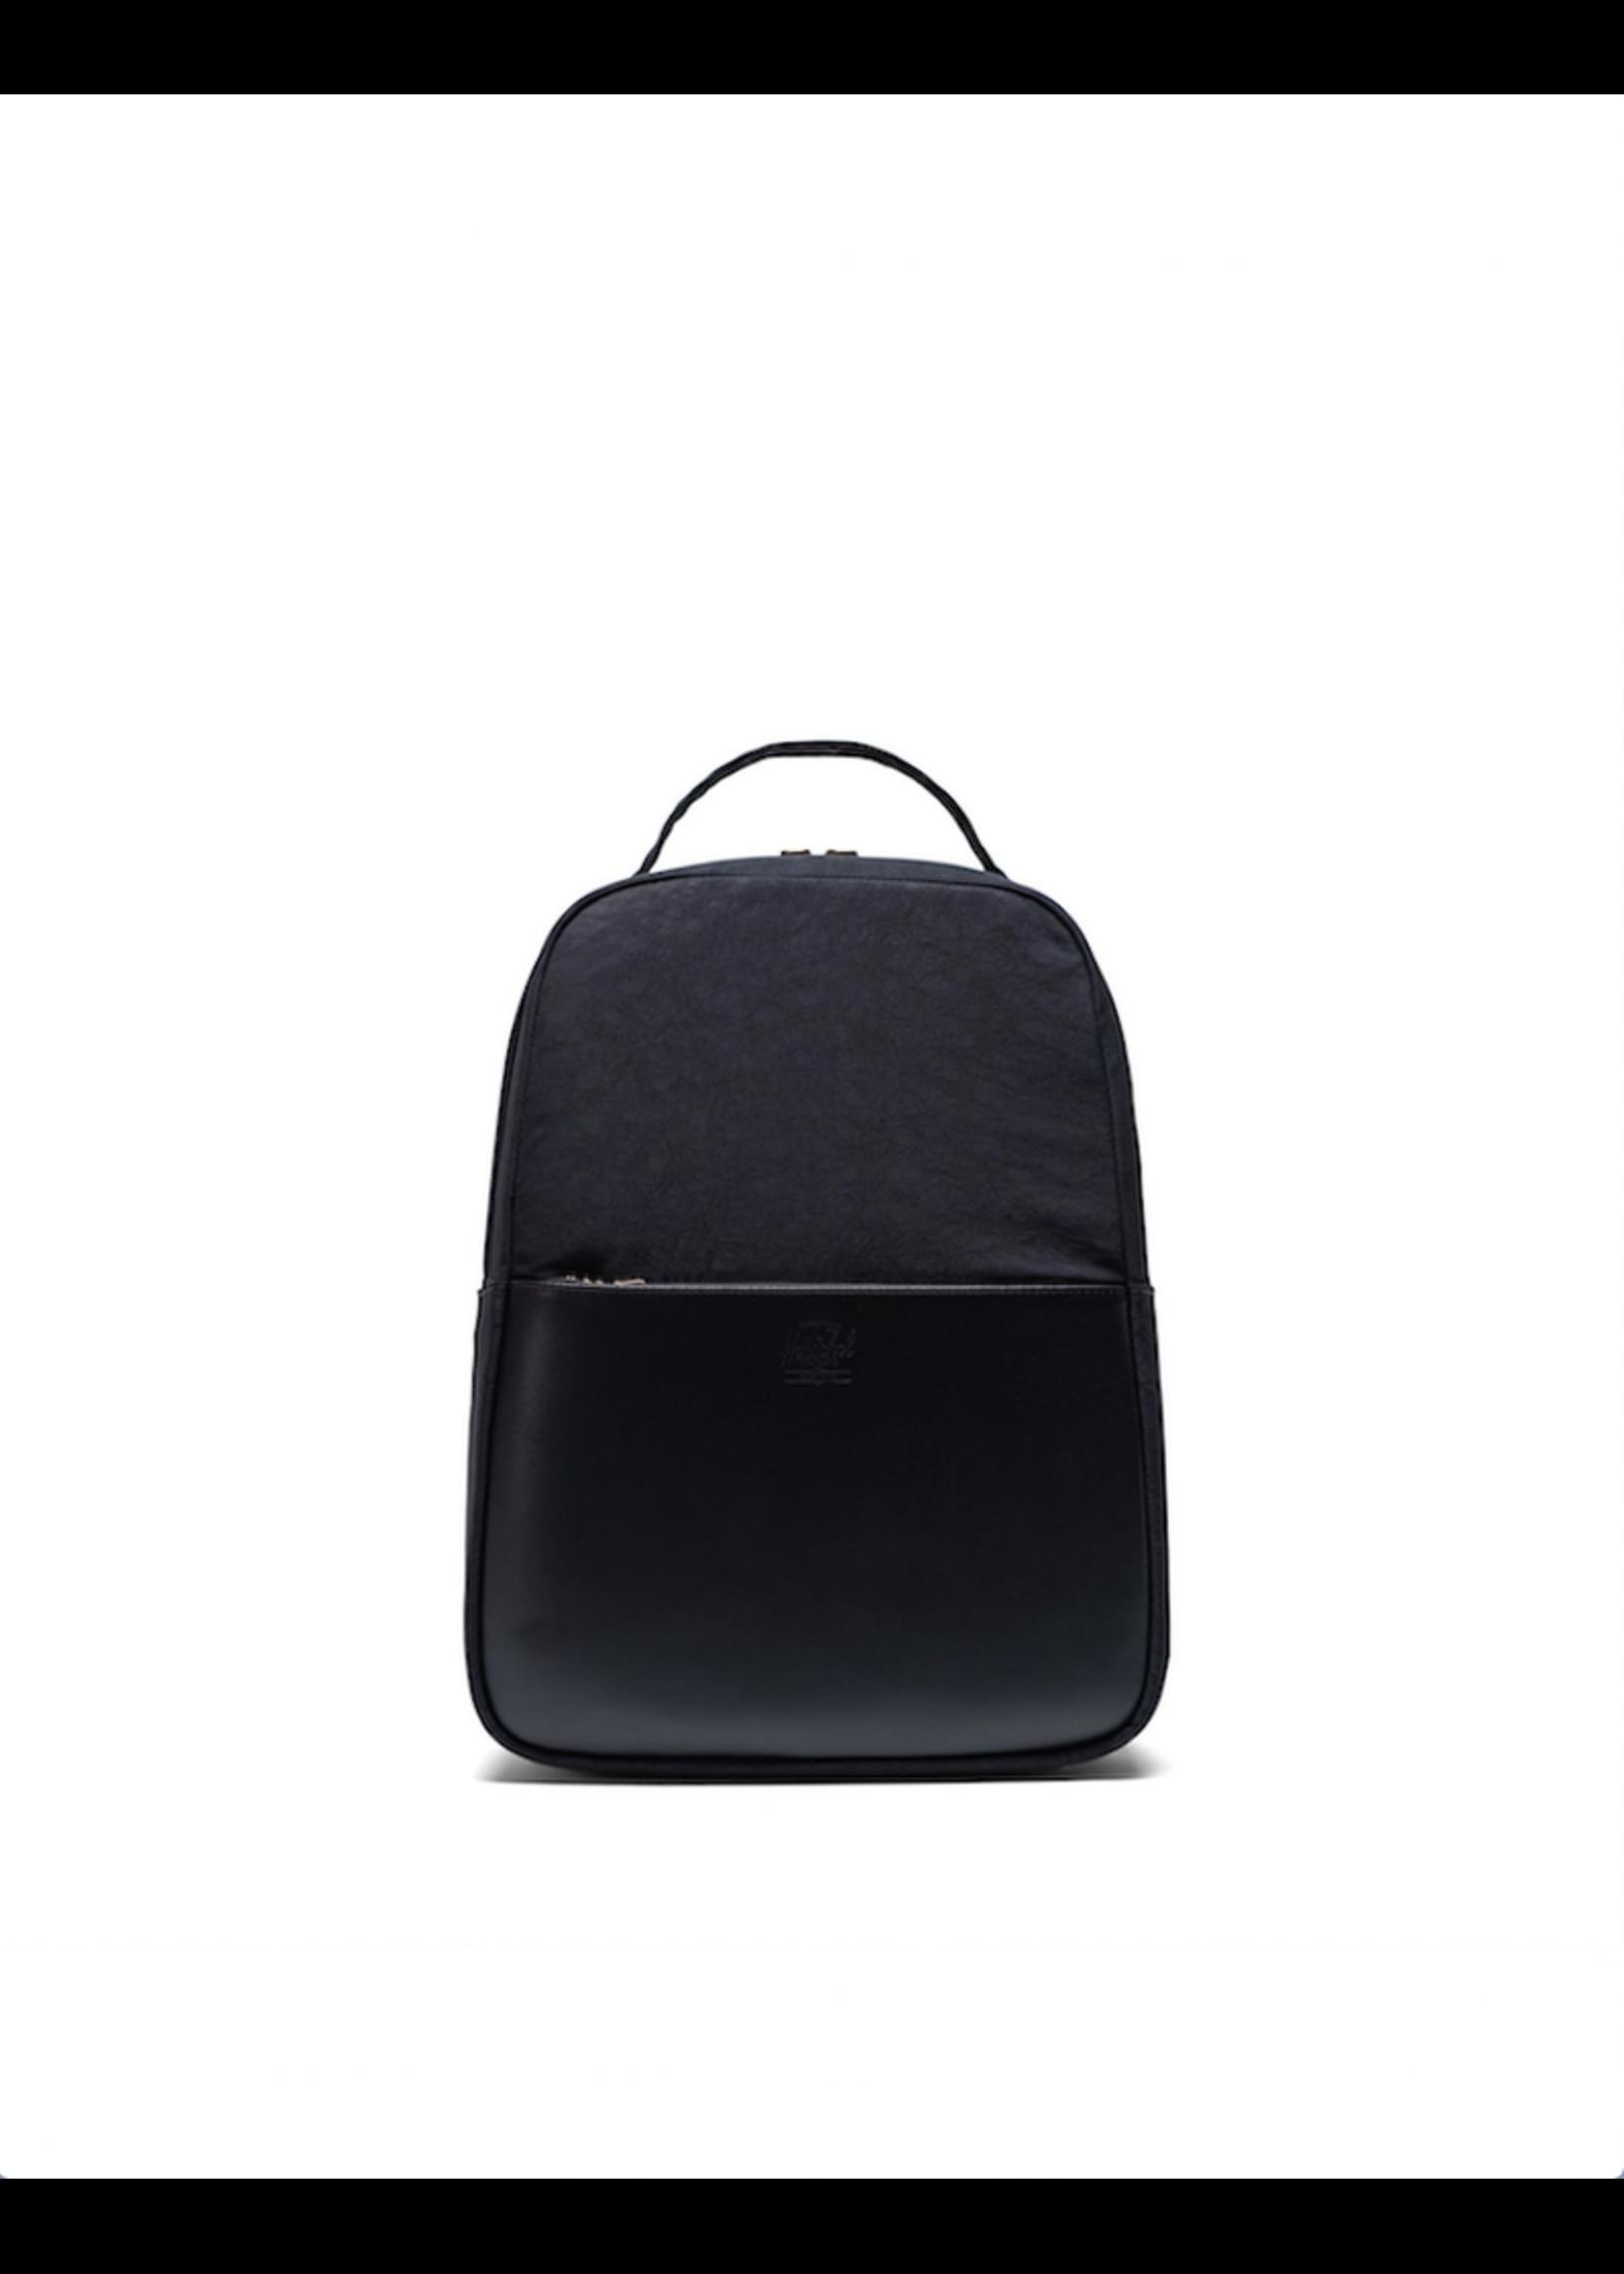 Herschel Supply Co. Herschel Supply, Orion Backpack, Black, 11.5L